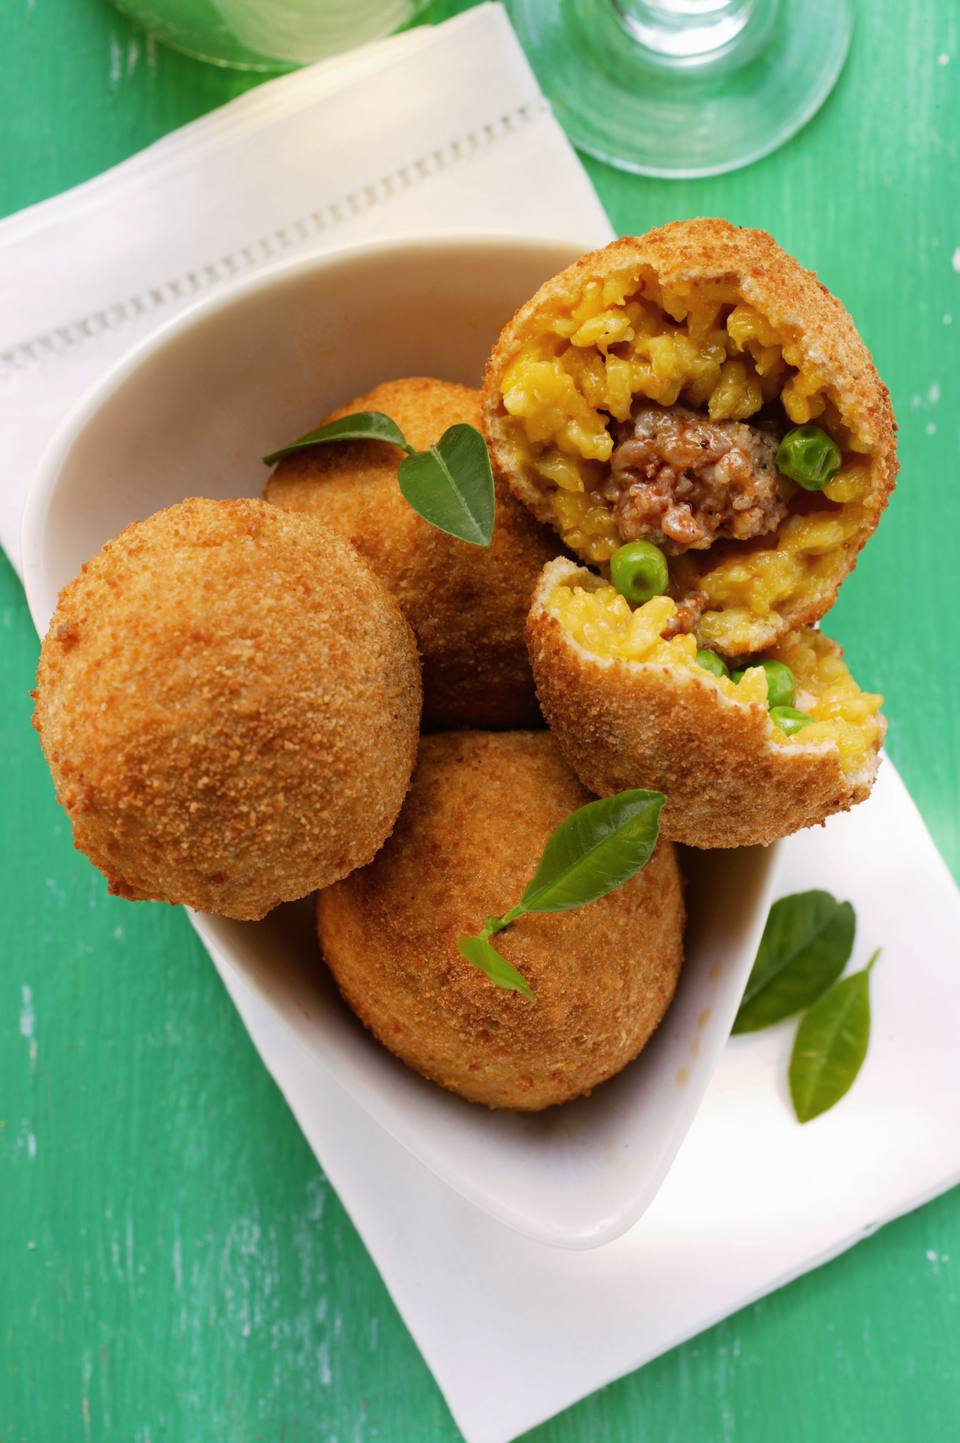 Arancini, Sicilian Rice Balls Stuffed with Meat Sauce and Peas